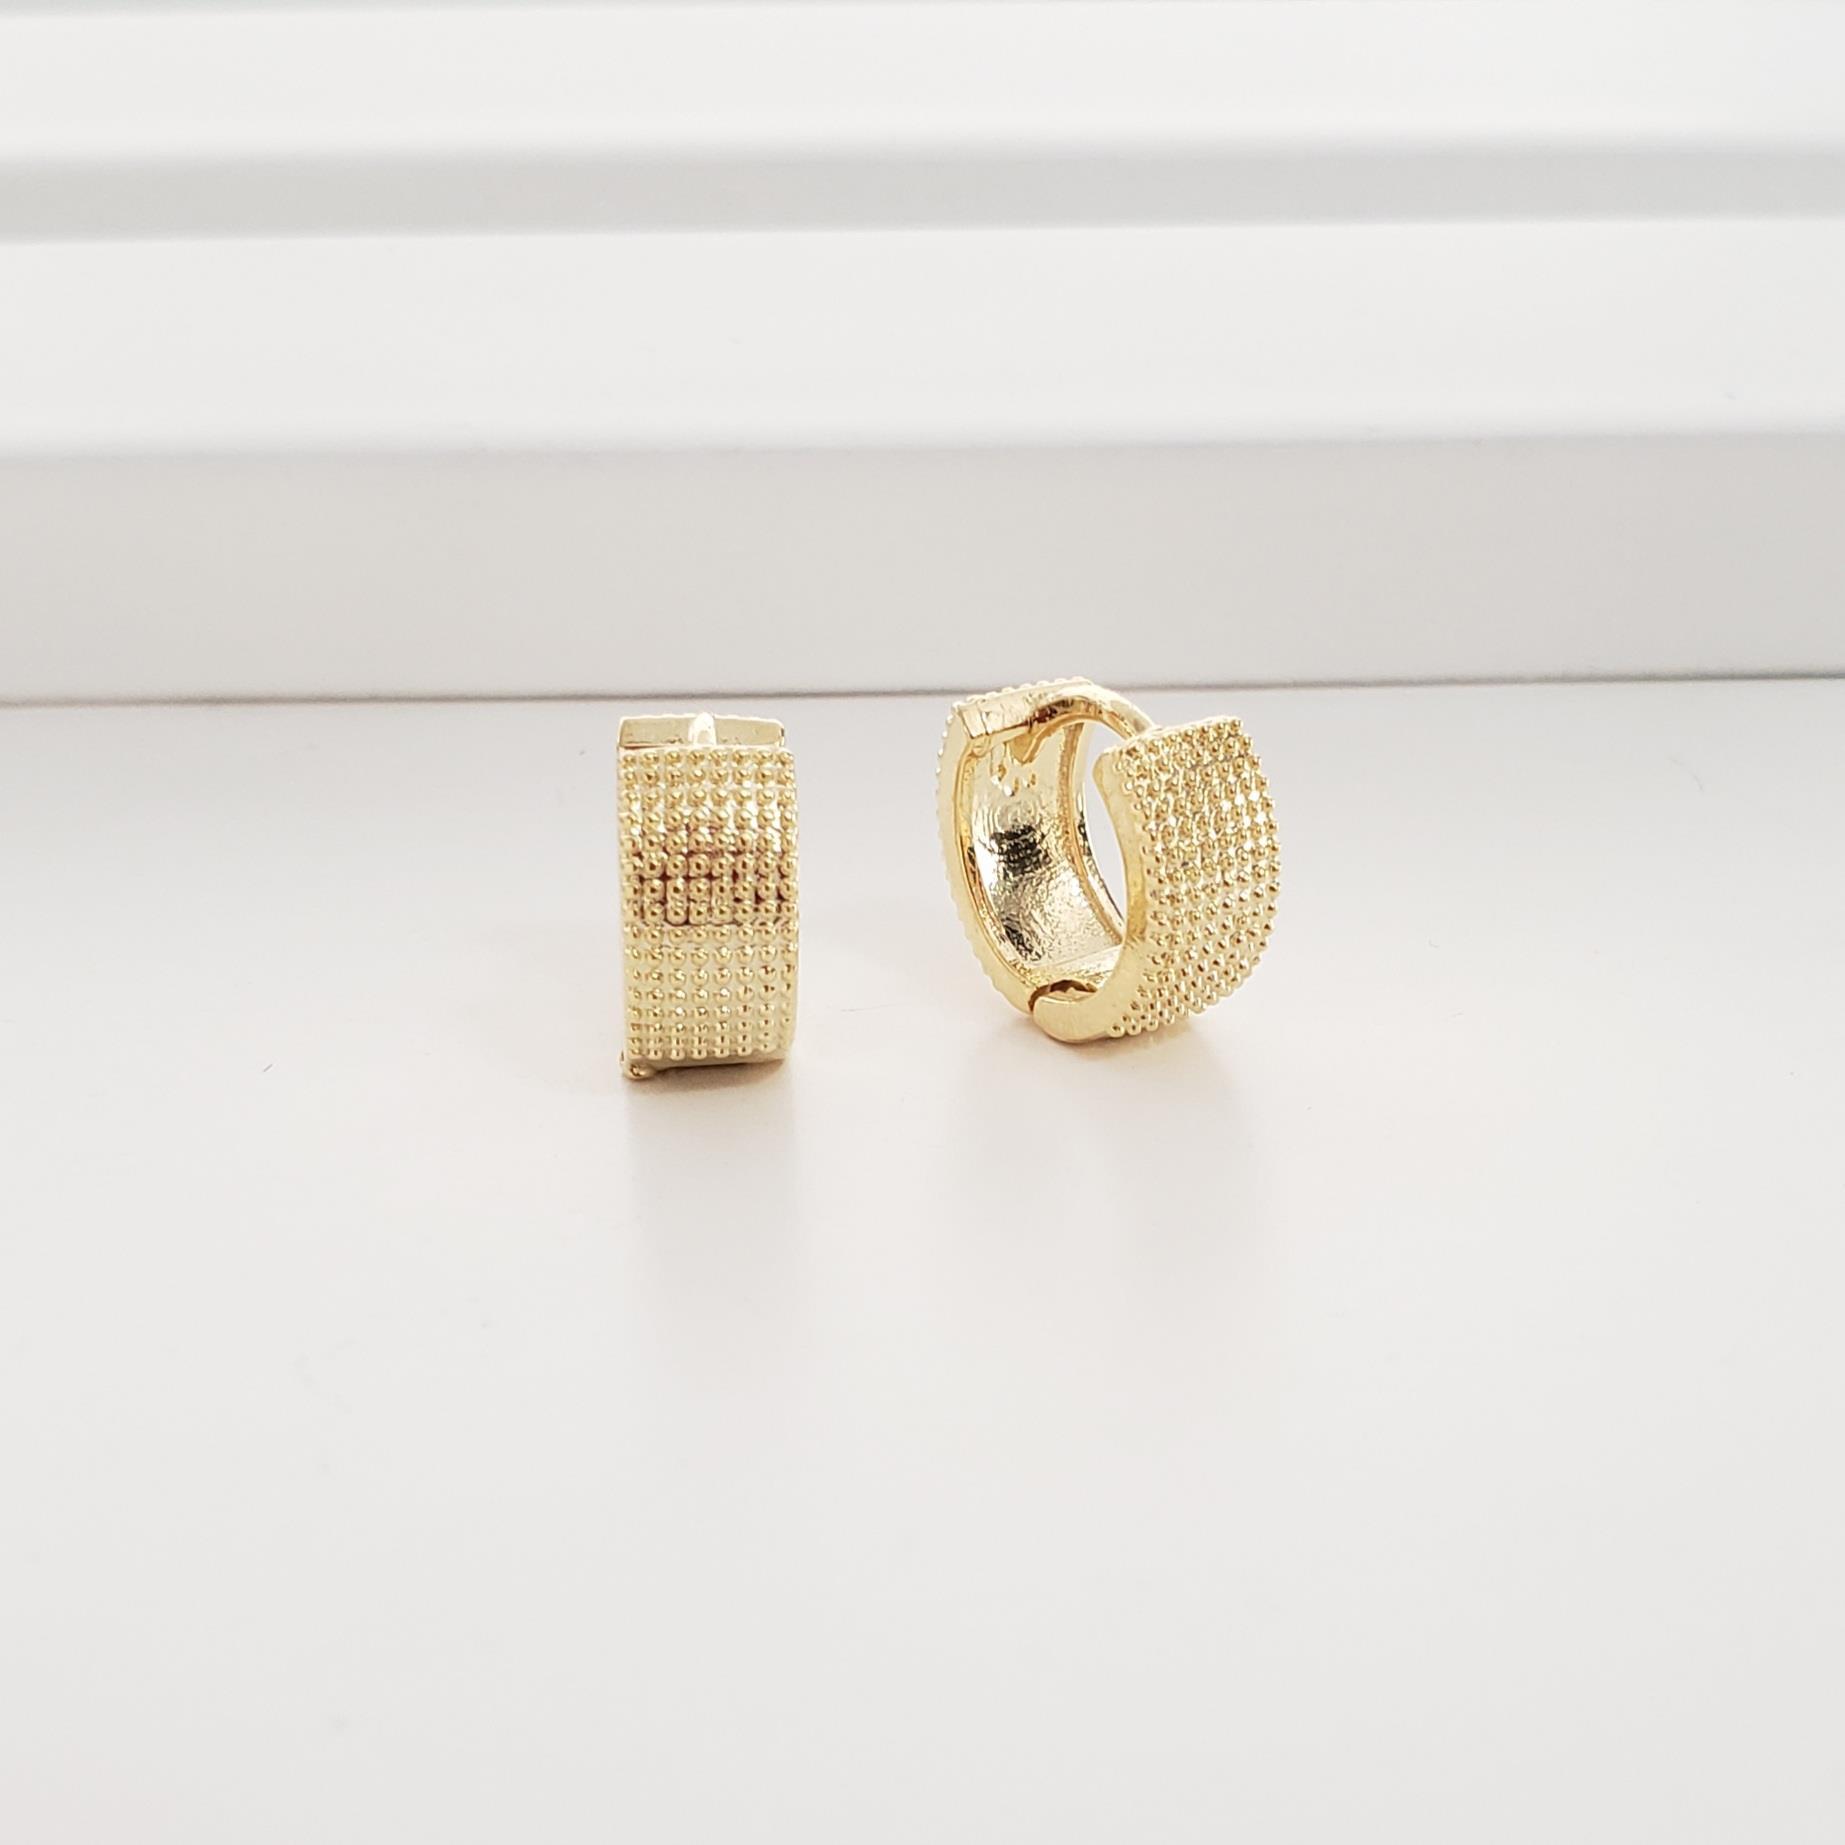 Brinco Argola 1,3cm Reta Pipoquinha no Banho Ouro 18k Semijoia